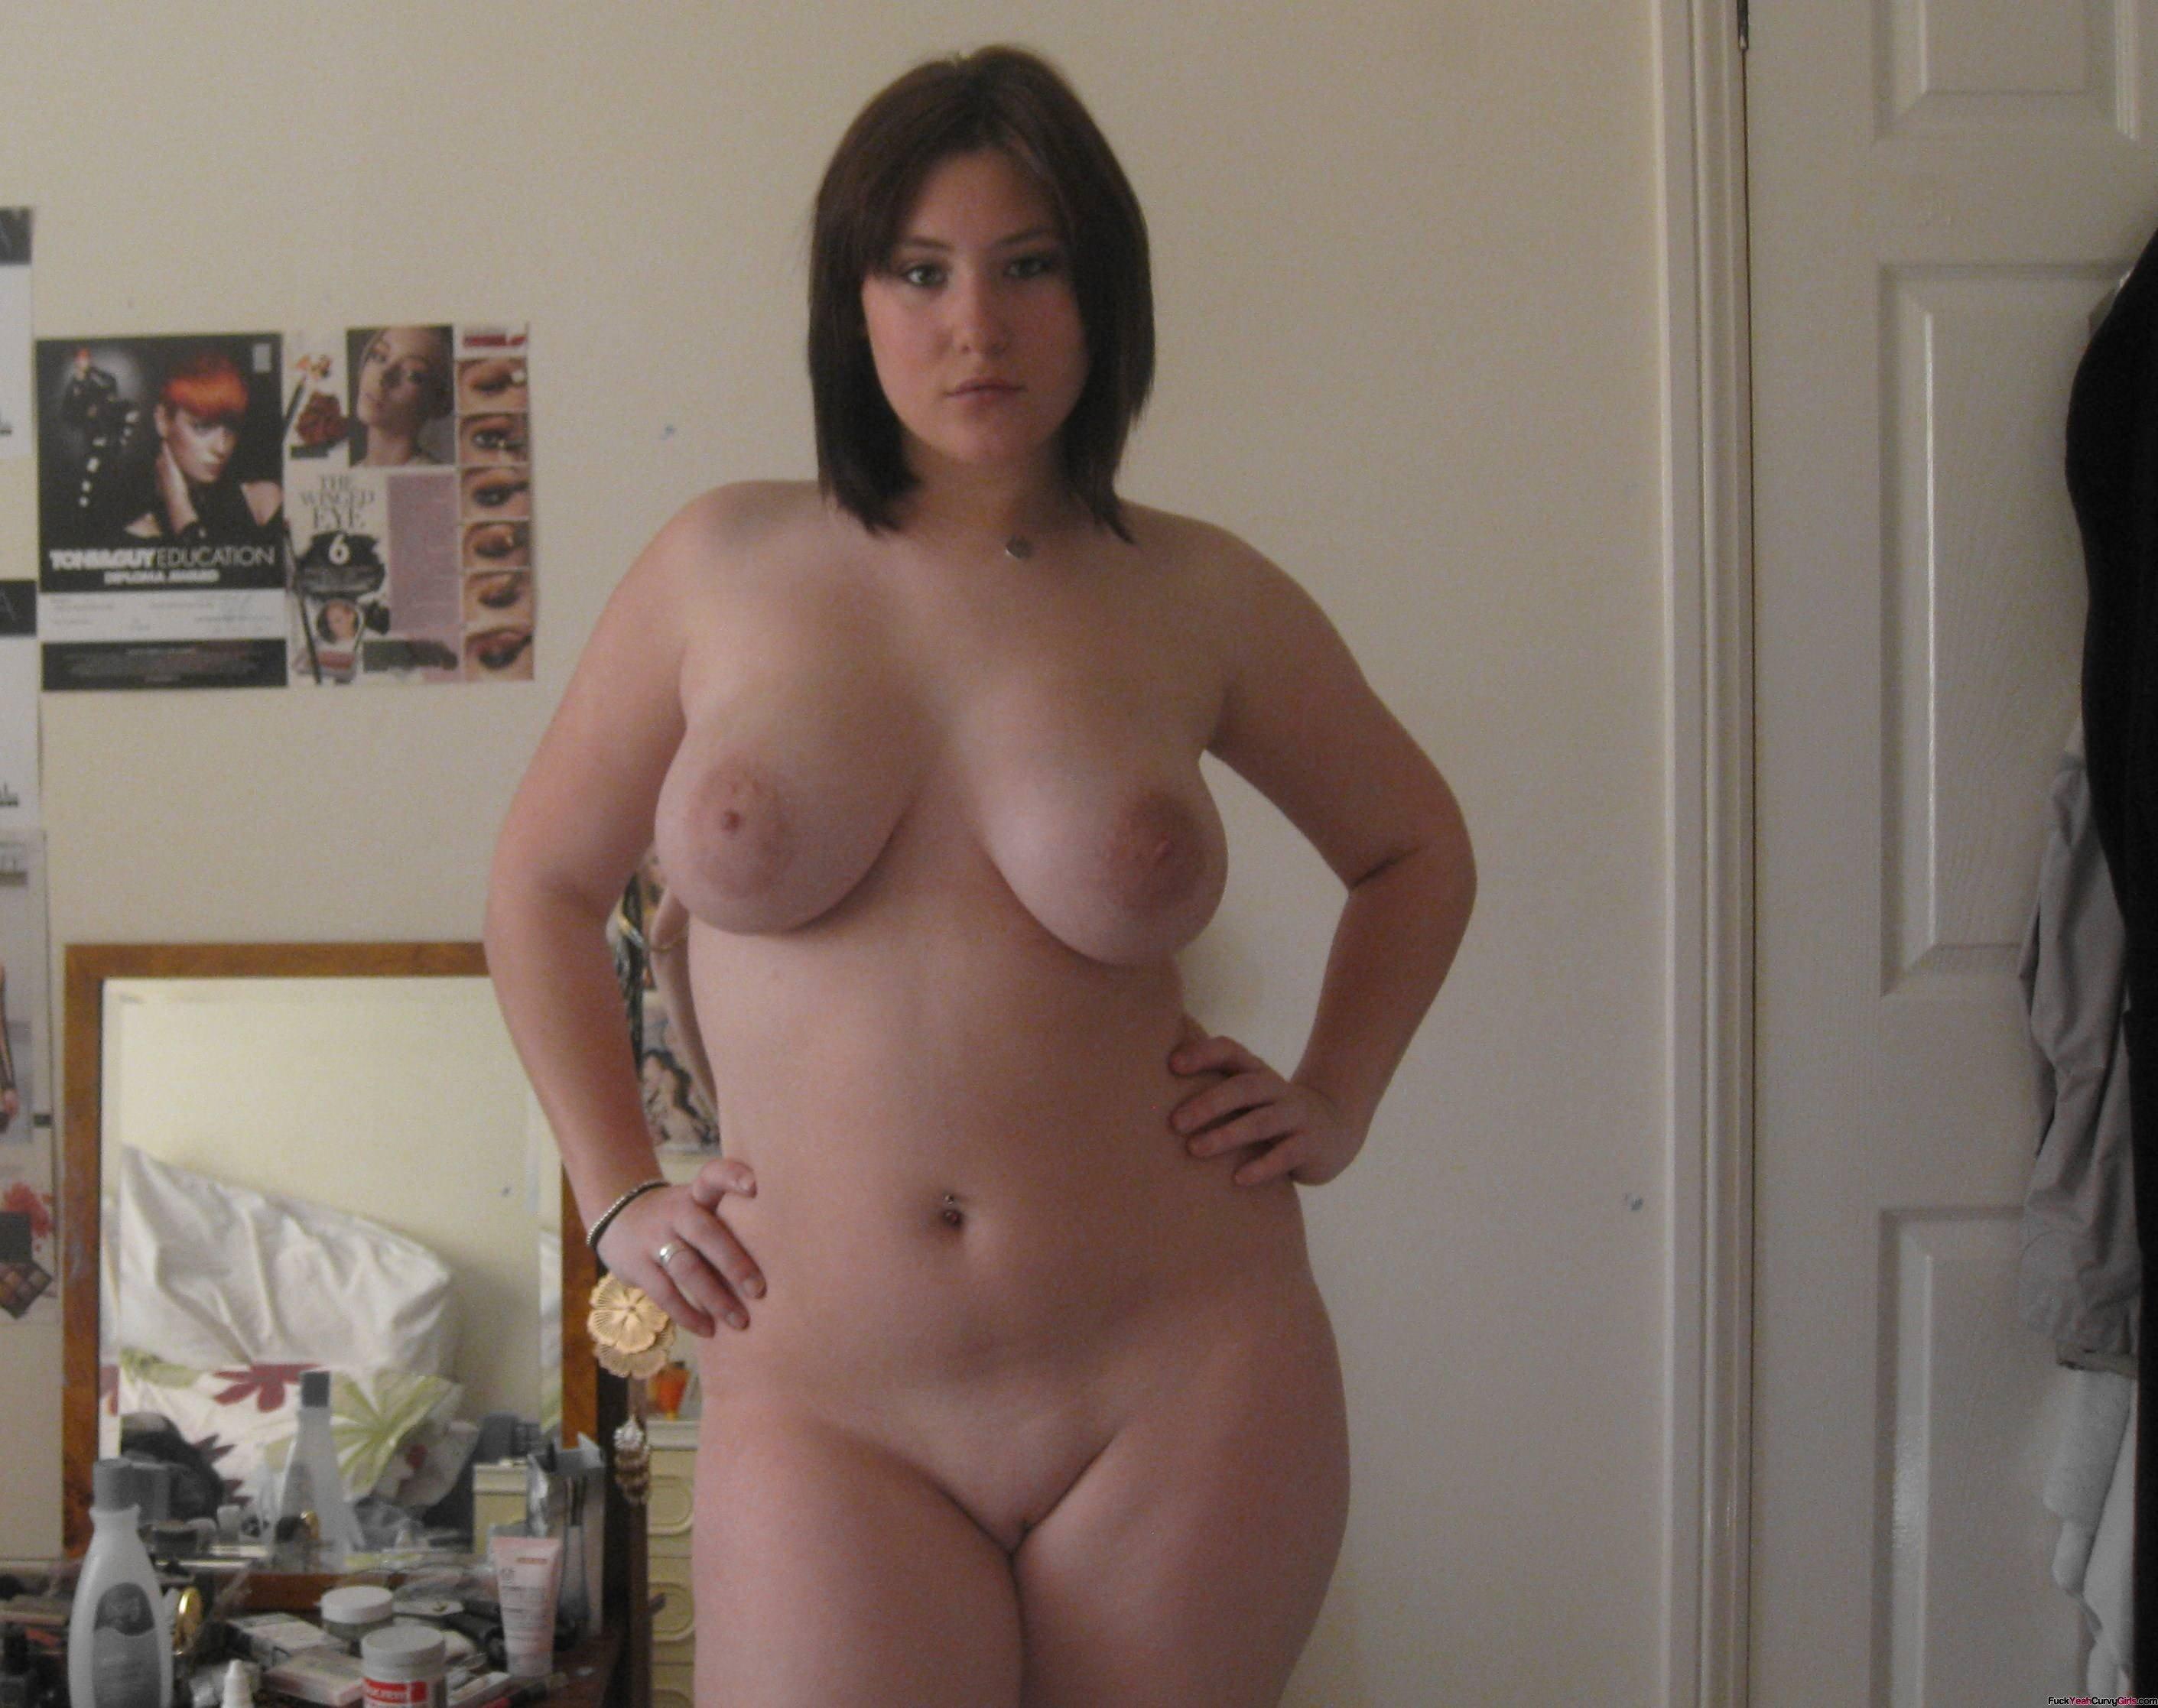 Homemade chubby redhead amateur nude women